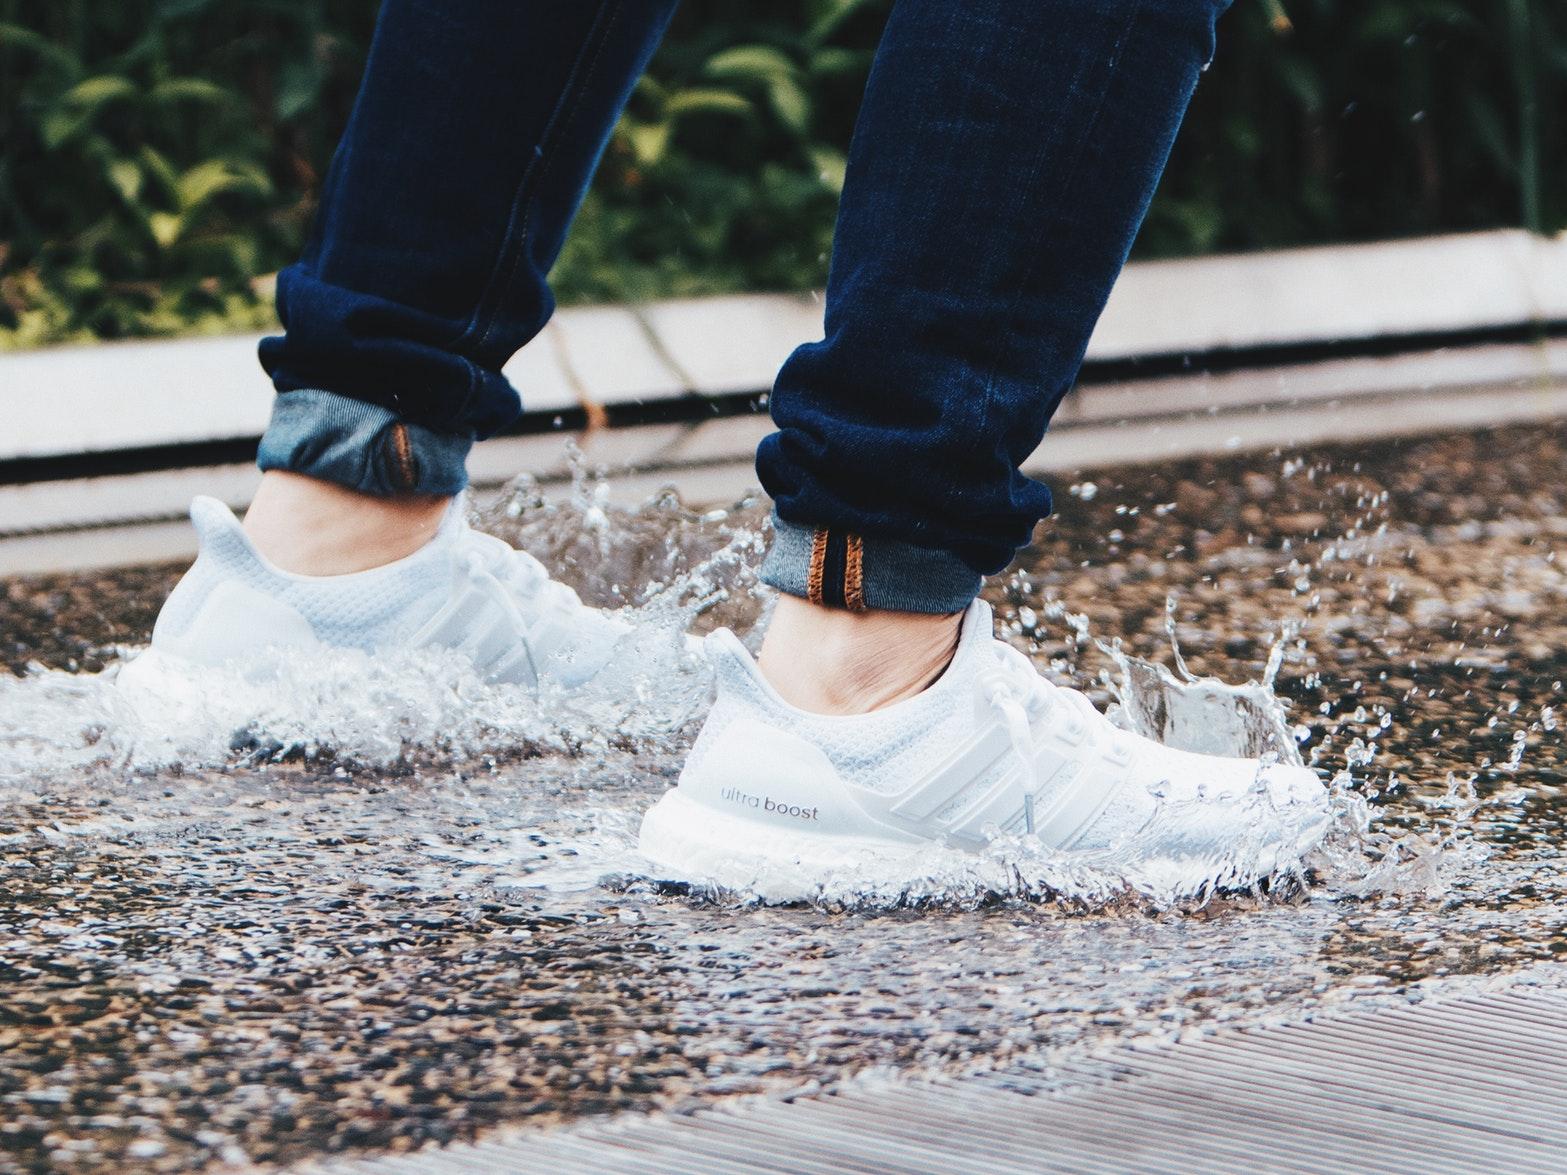 splash Best water shoes